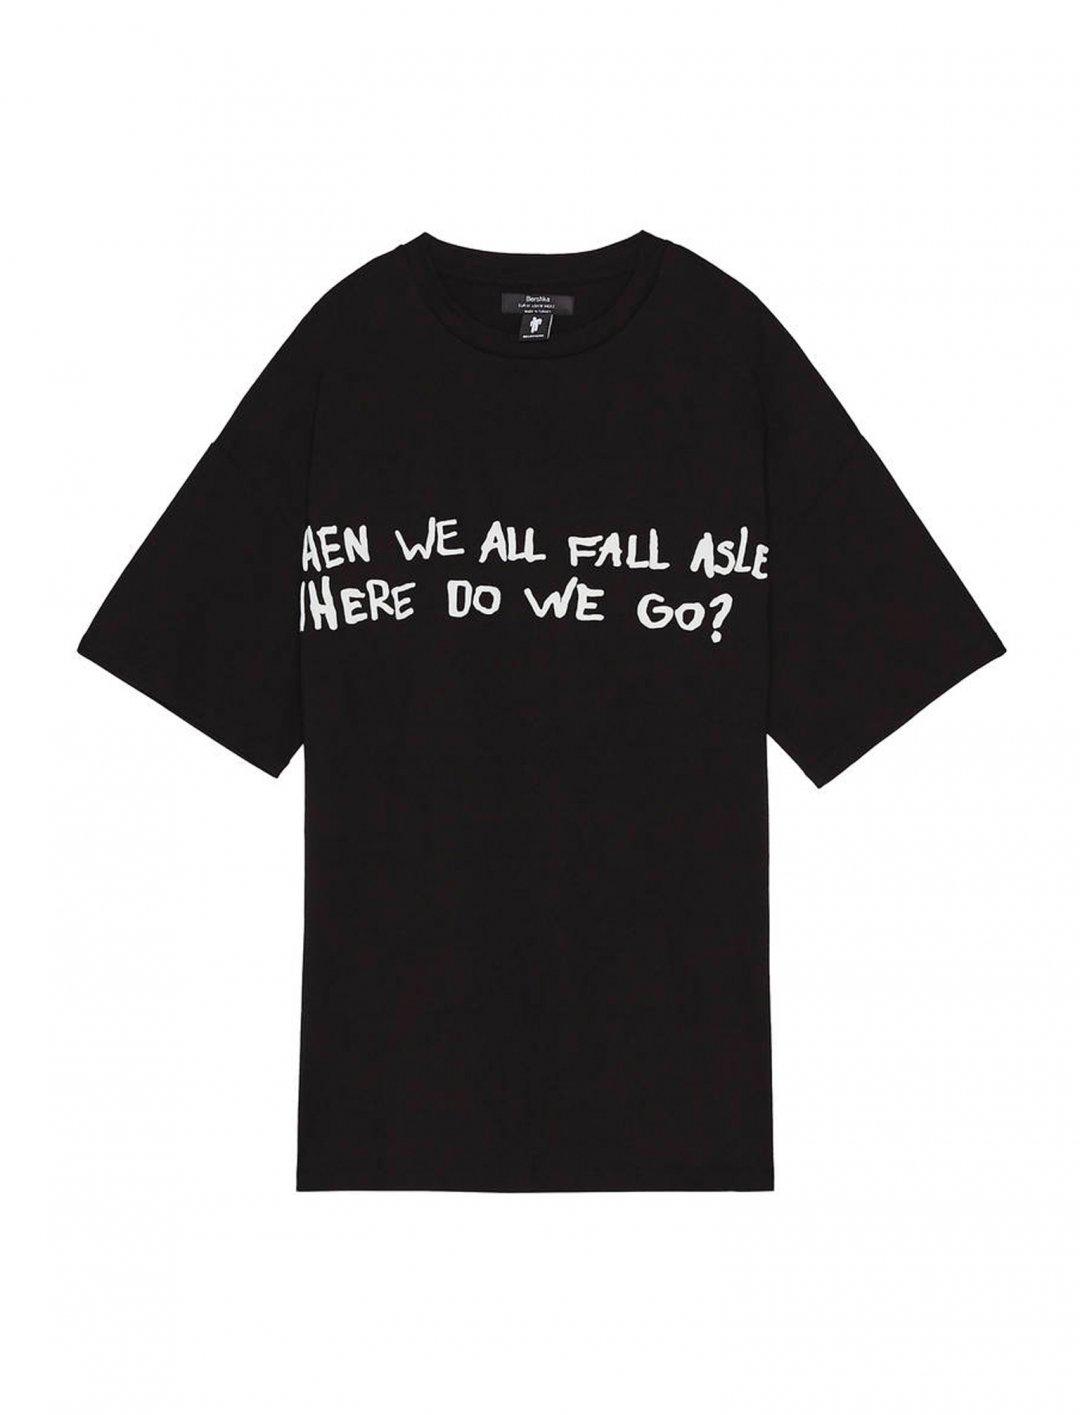 "T-shirt With Slogan {""id"":5,""product_section_id"":1,""name"":""Clothing"",""order"":5} Billie Eilish x Bershka"